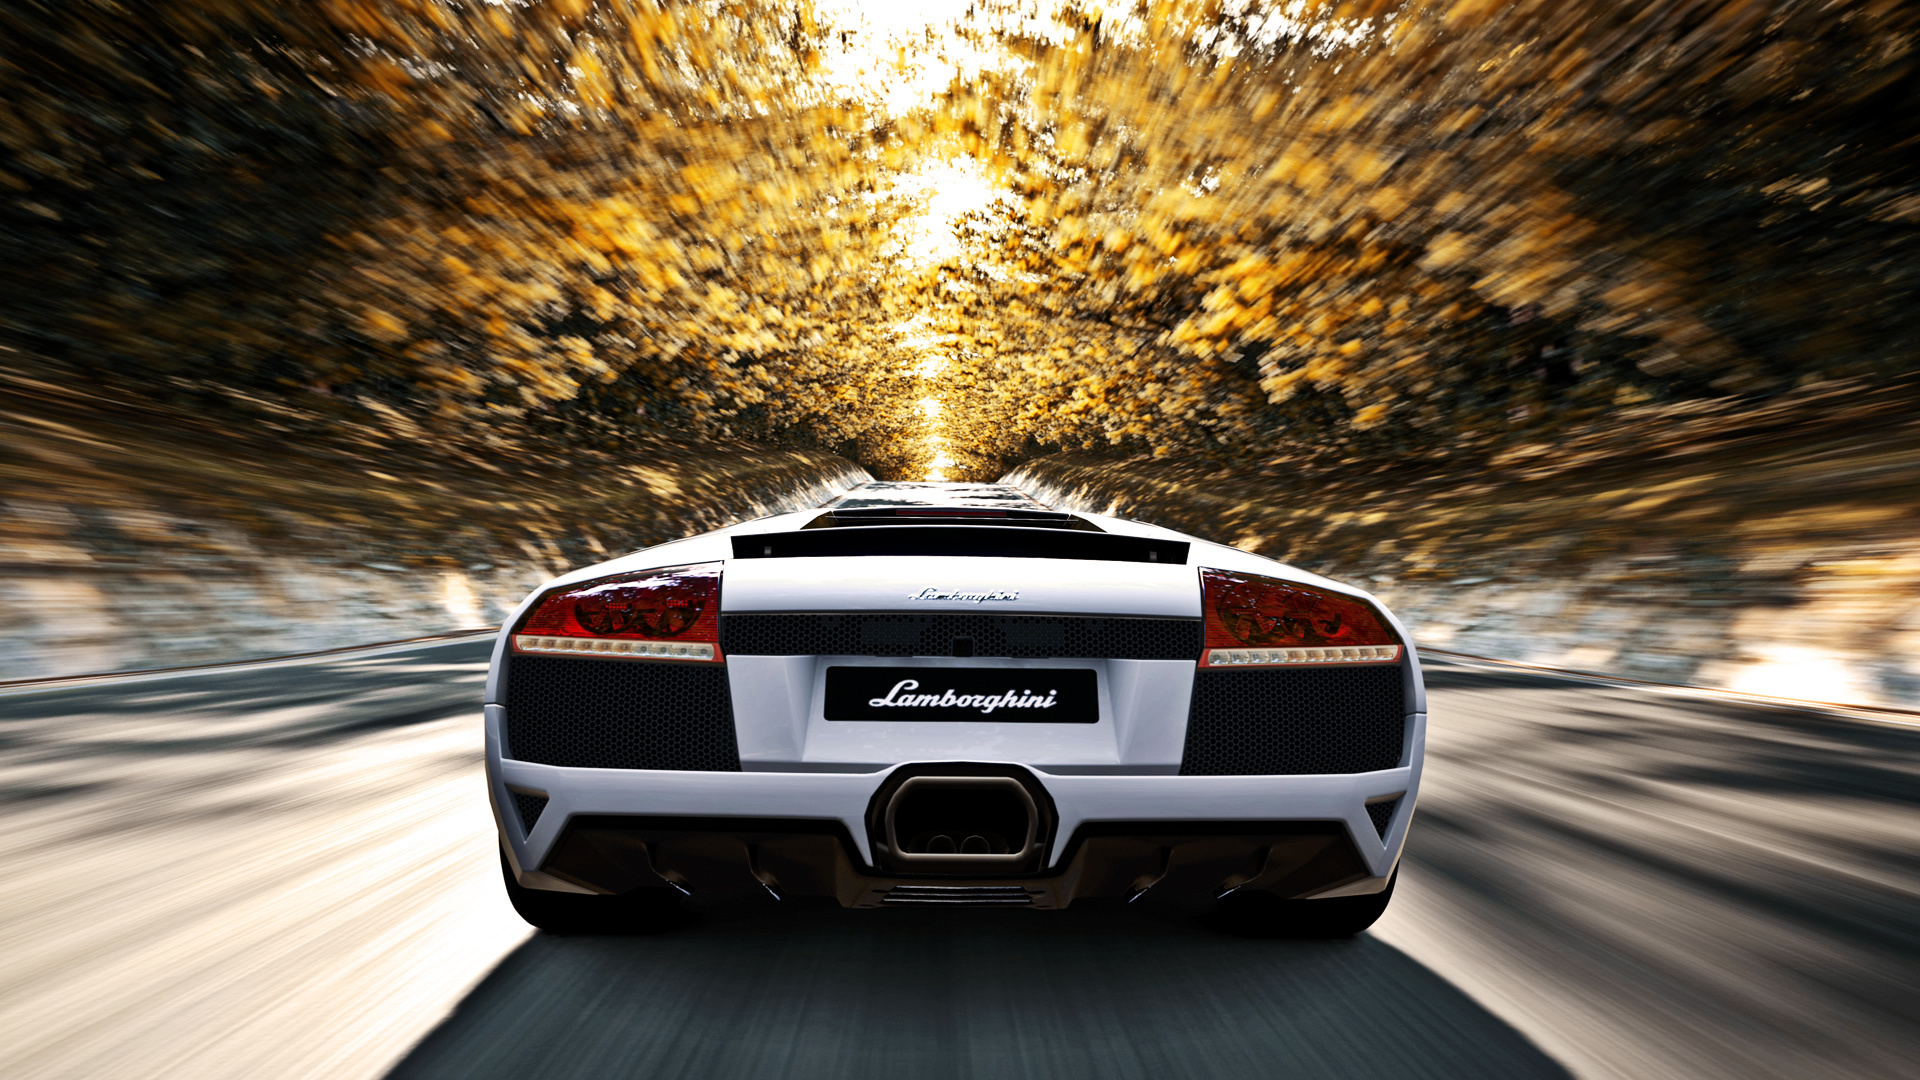 26 Excellent HD Lamborghini Wallpapers